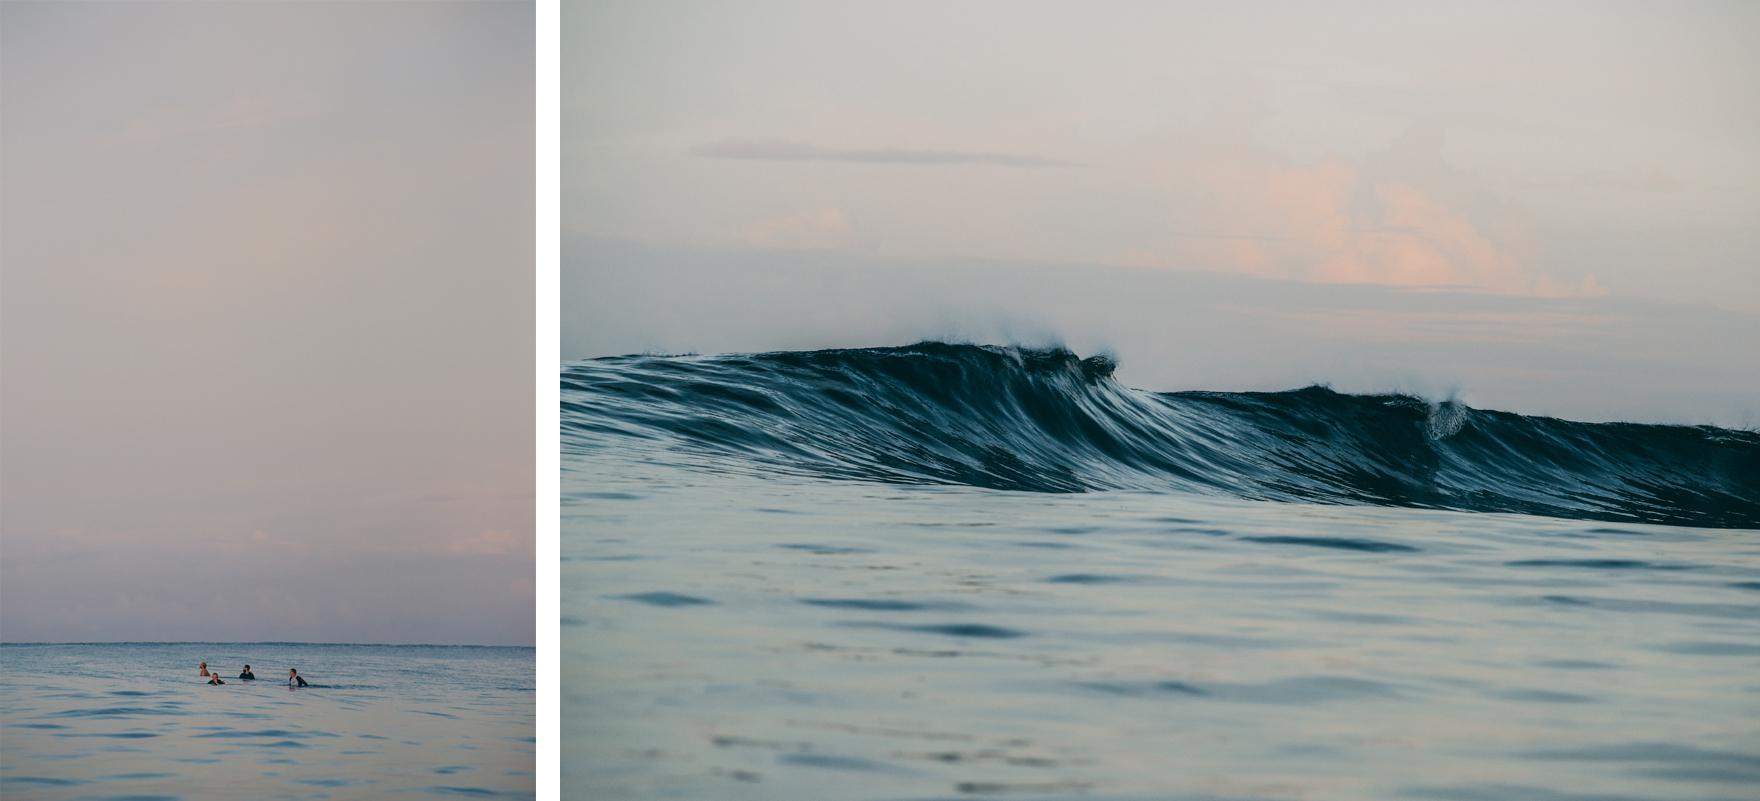 Samoa-Lola-Photography-12.jpg